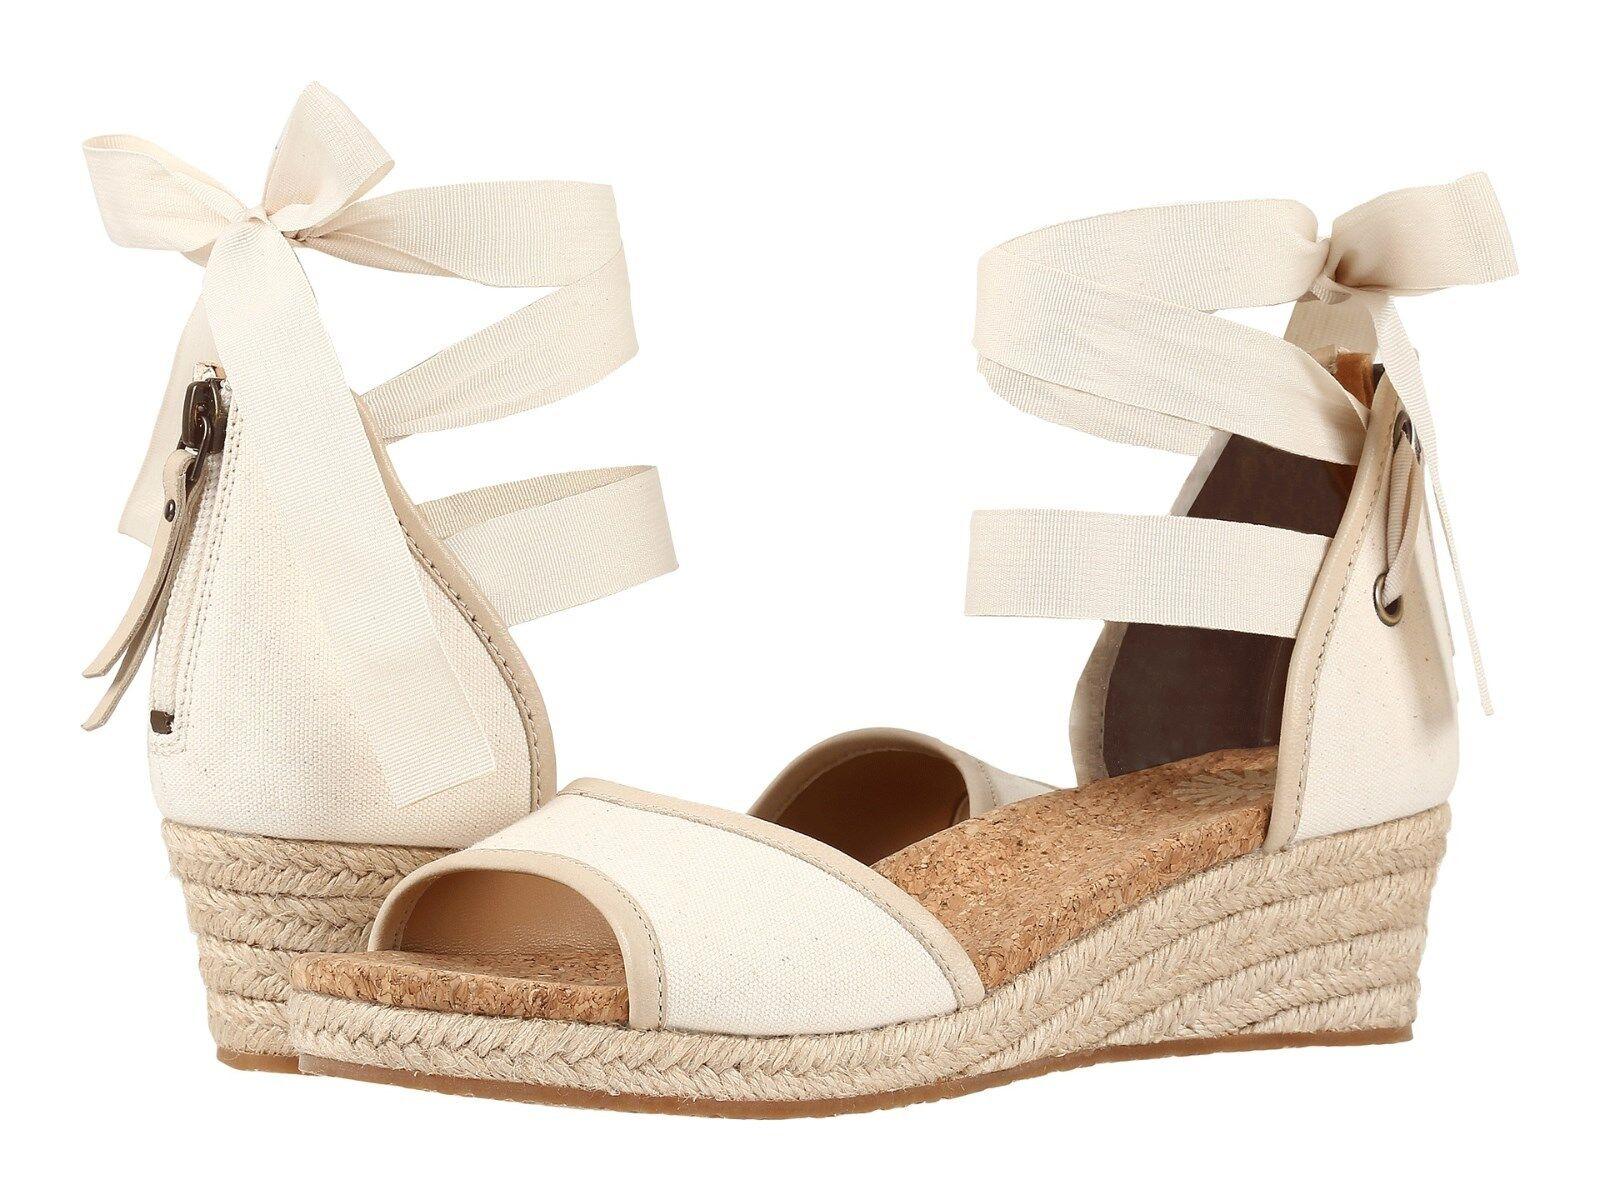 CK Jeans Women's Hope Wedge Slide Sandal - Choose SZ/Color